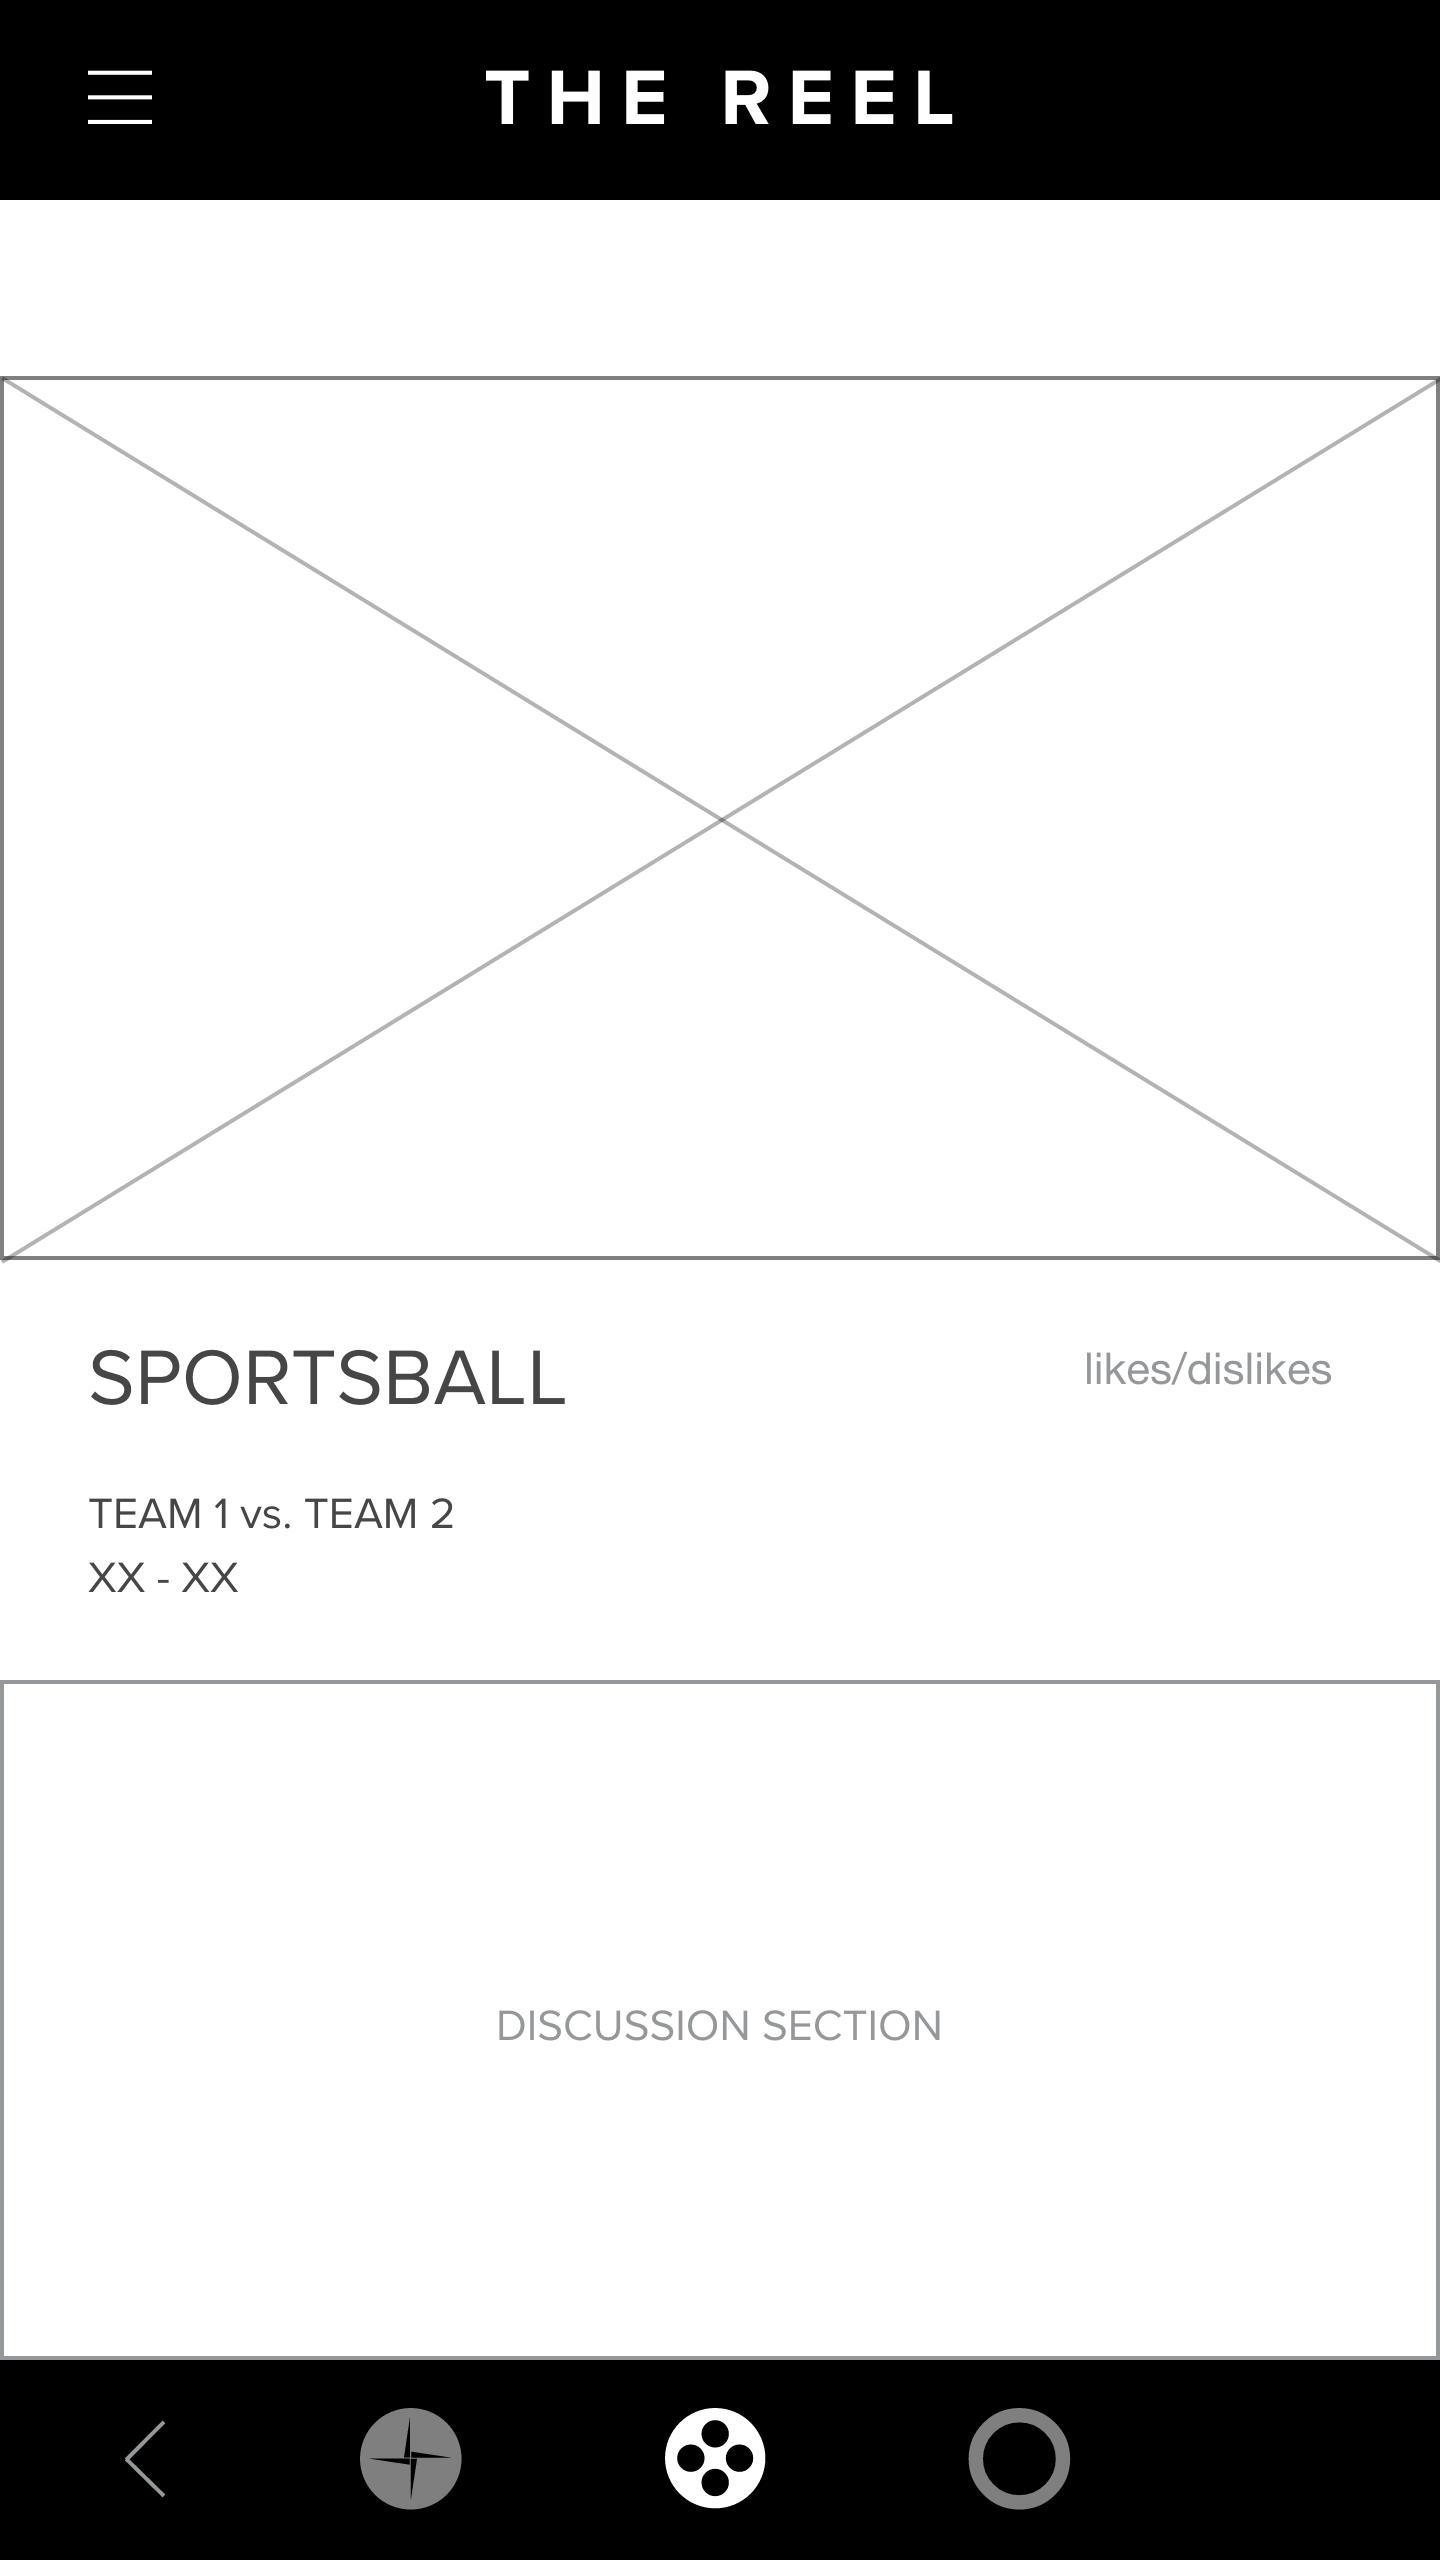 Sportsball View